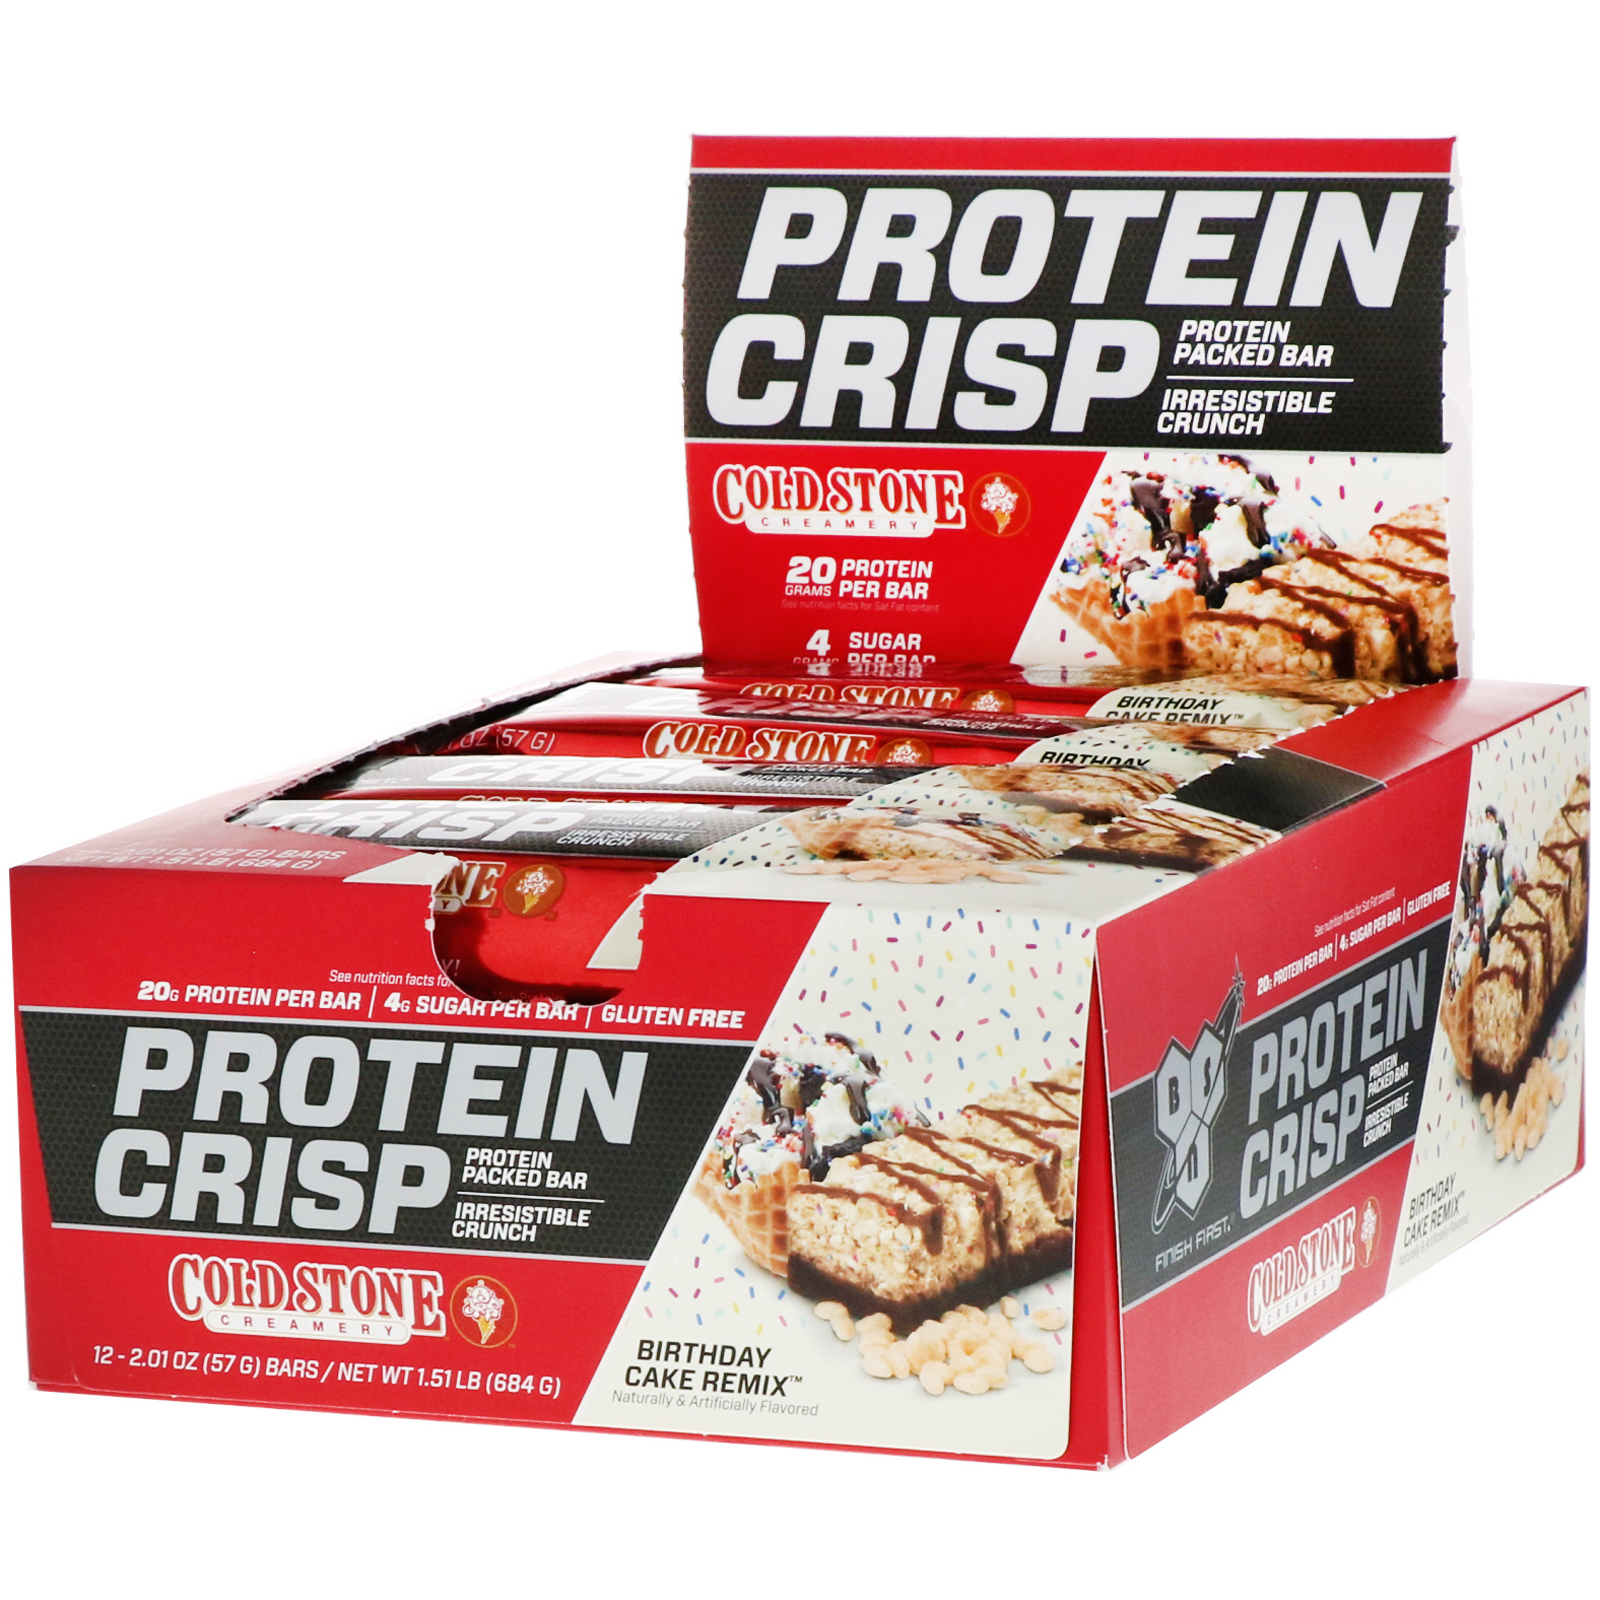 Bsn Protein Crisp Birthday Cake Remix 12 Bars 2 01 Oz 57 G Each Iherb